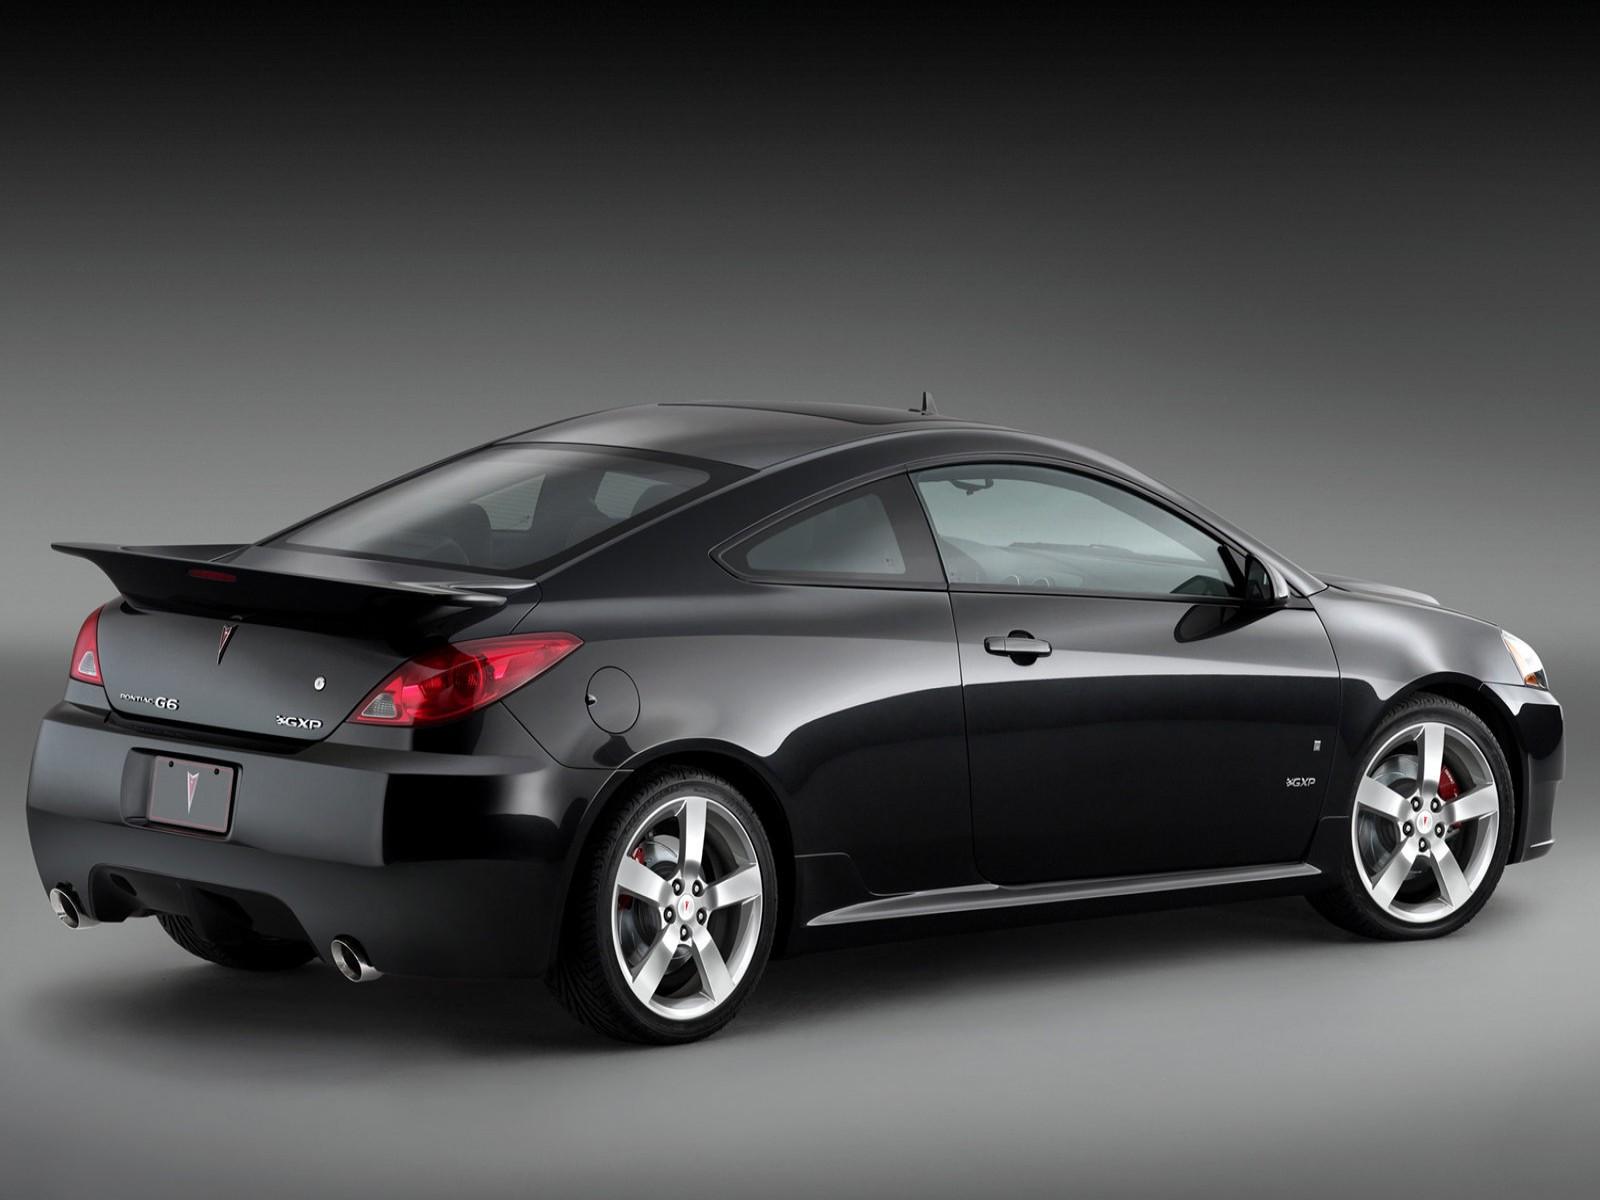 http://3.bp.blogspot.com/-41PLPei5V5Y/TkUyJIjAXwI/AAAAAAAABCE/e7b0G9m7vlc/s1600/2007-pontiac-g6-gxp-show-car-1600x1200-image-2.jpg